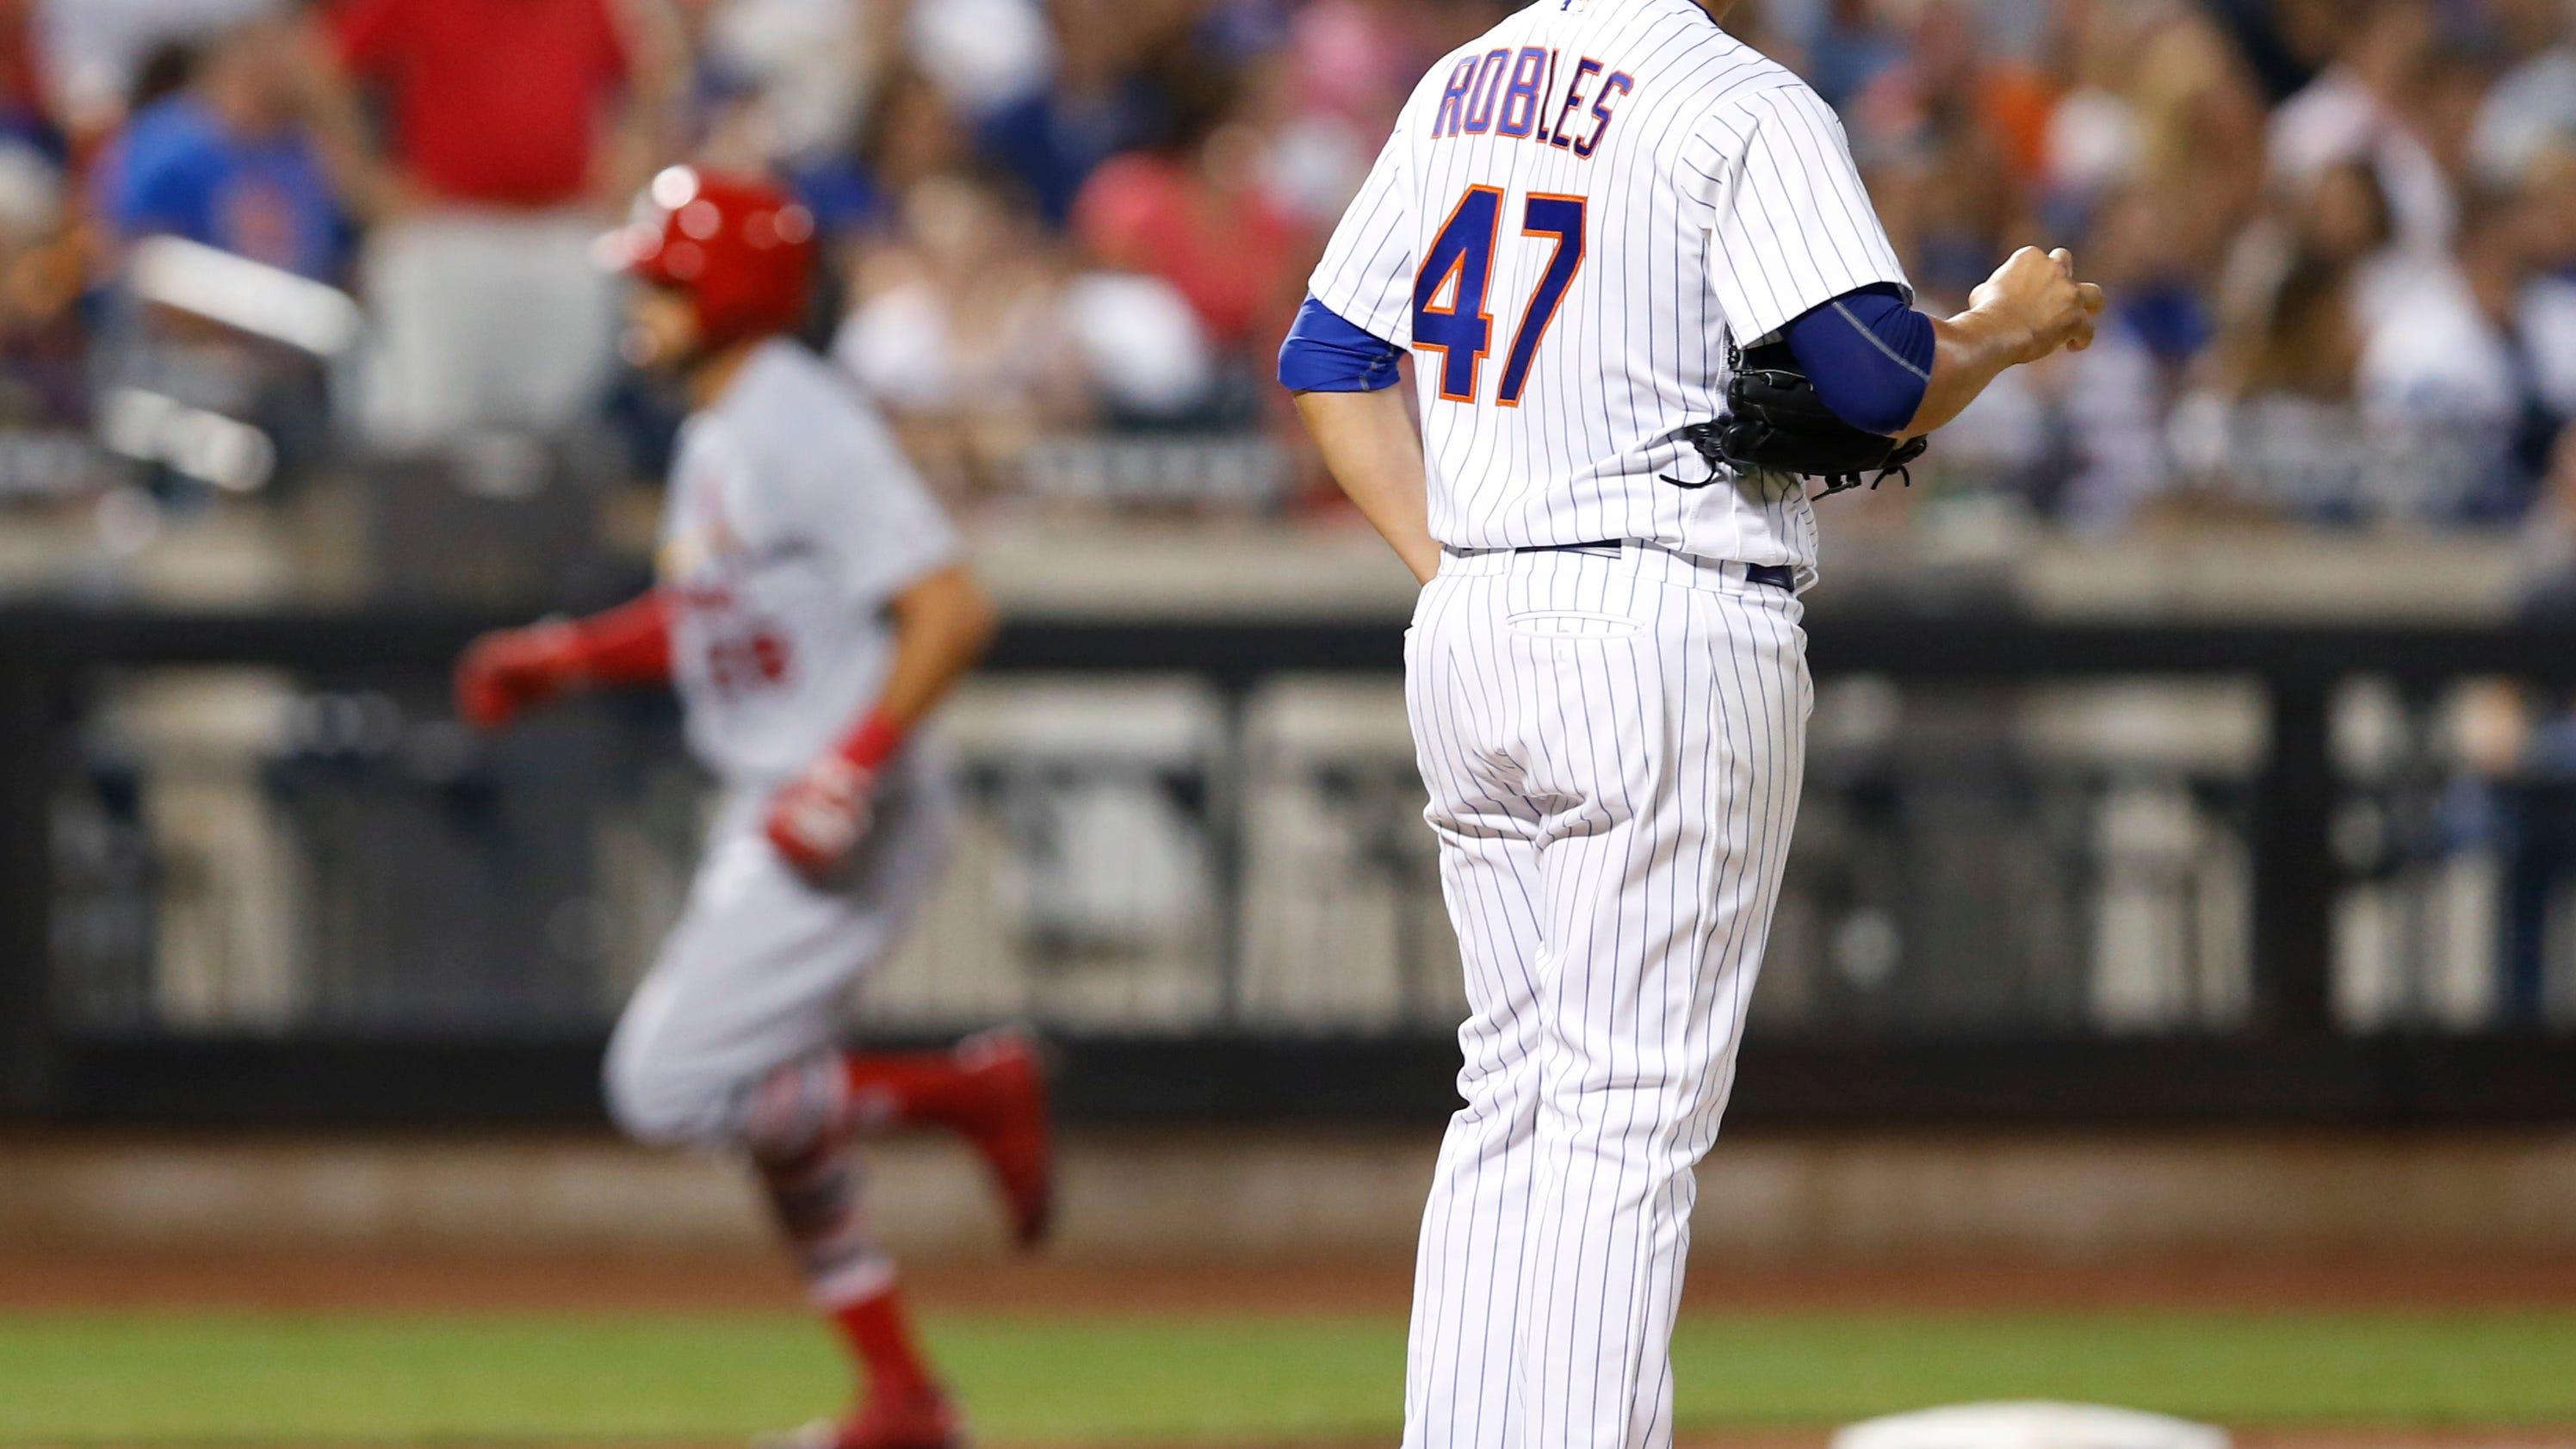 DeJong decks Mets again, Wainwright leads Cards to 6-3 win